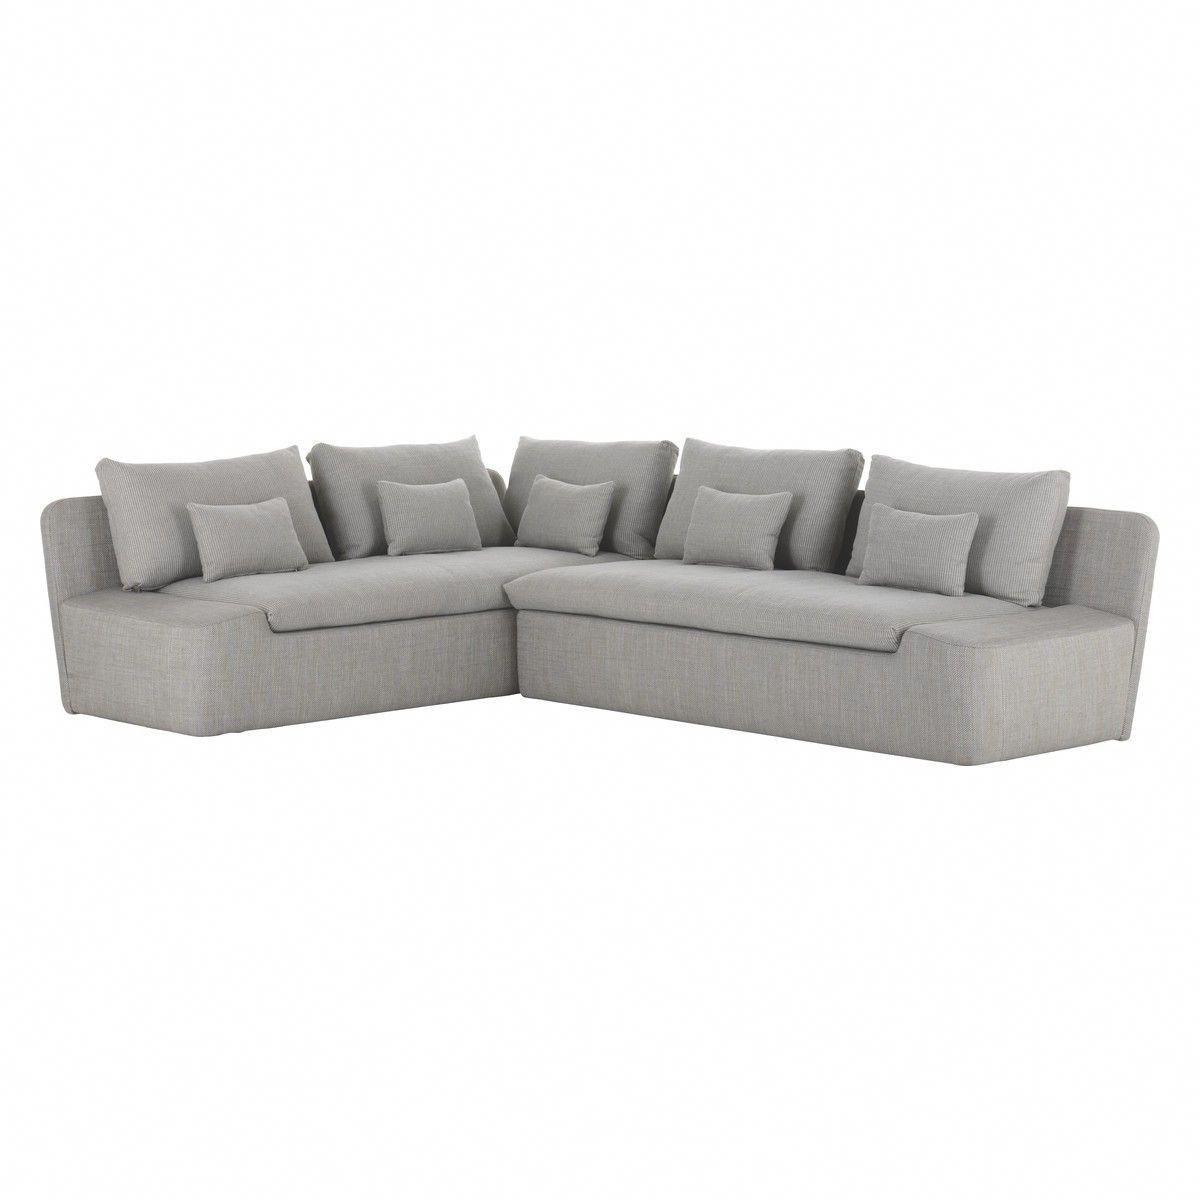 Gray Corner Sofas Lead You To Trendy Fashionable World Grey Corner Sofa Light Grey Leather Couch Corner Sofa